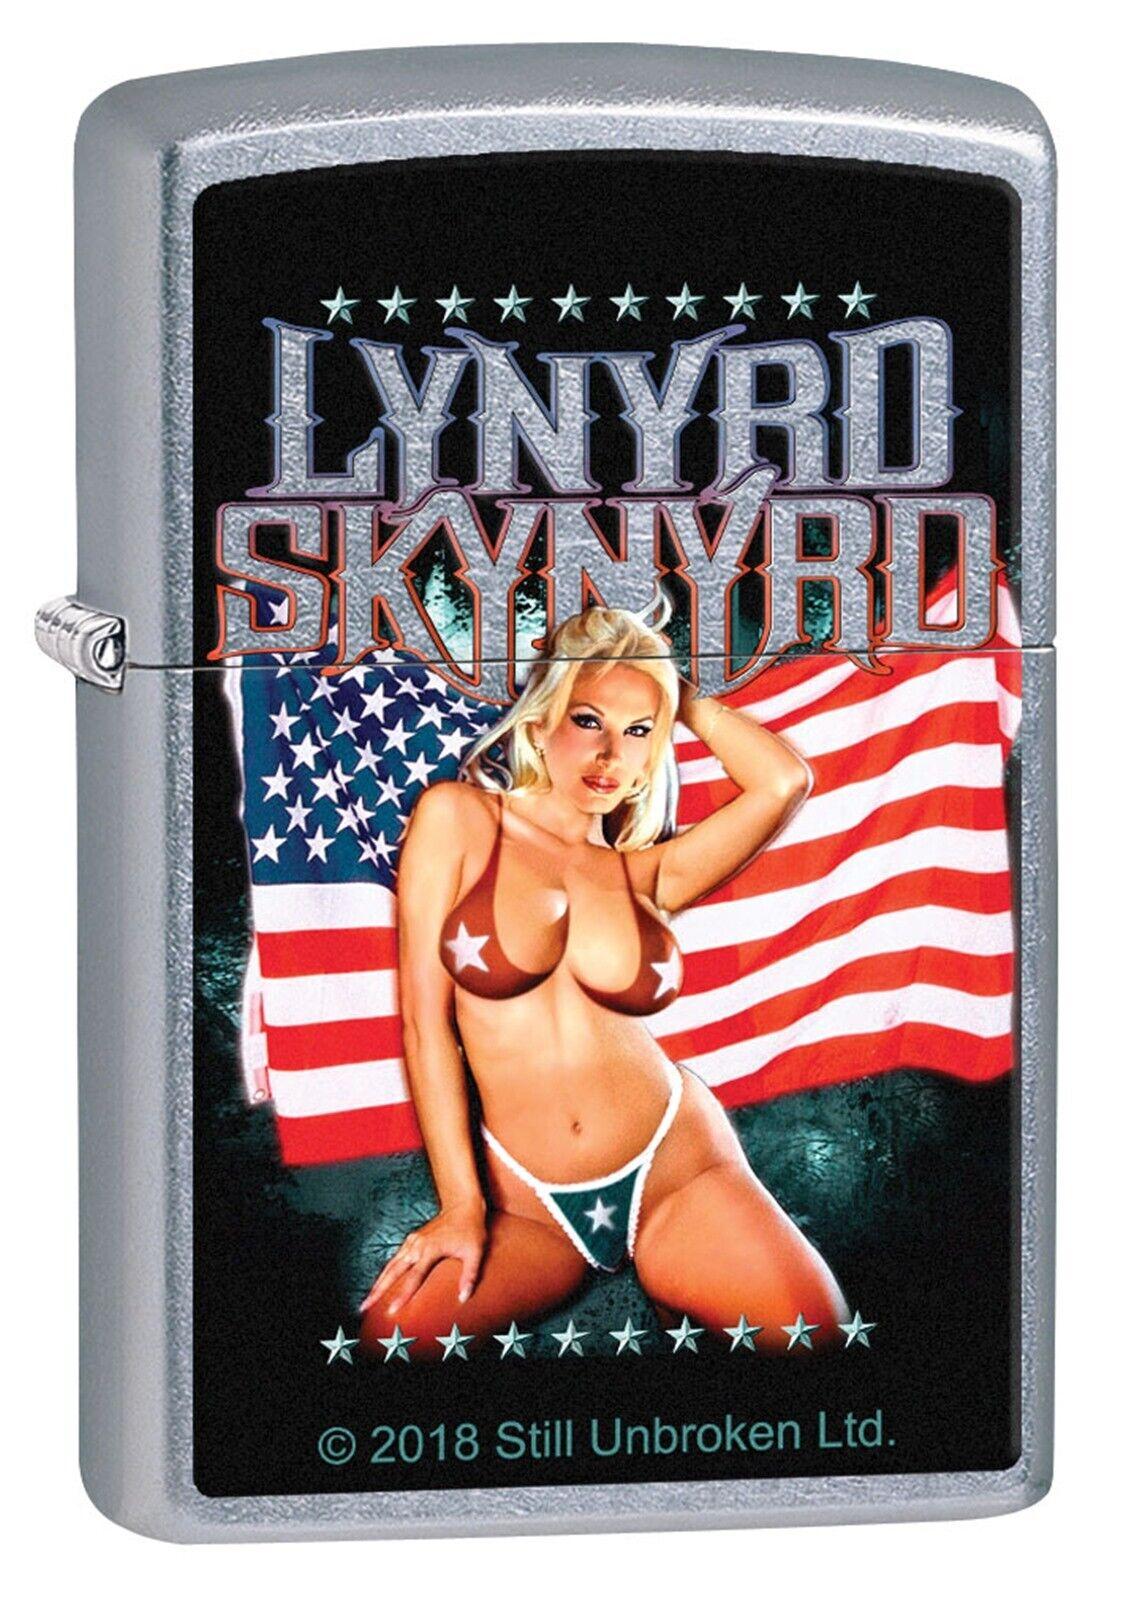 Zippo Lighter: Lynyrd Skynyrd Bikini Girl & American Flag -